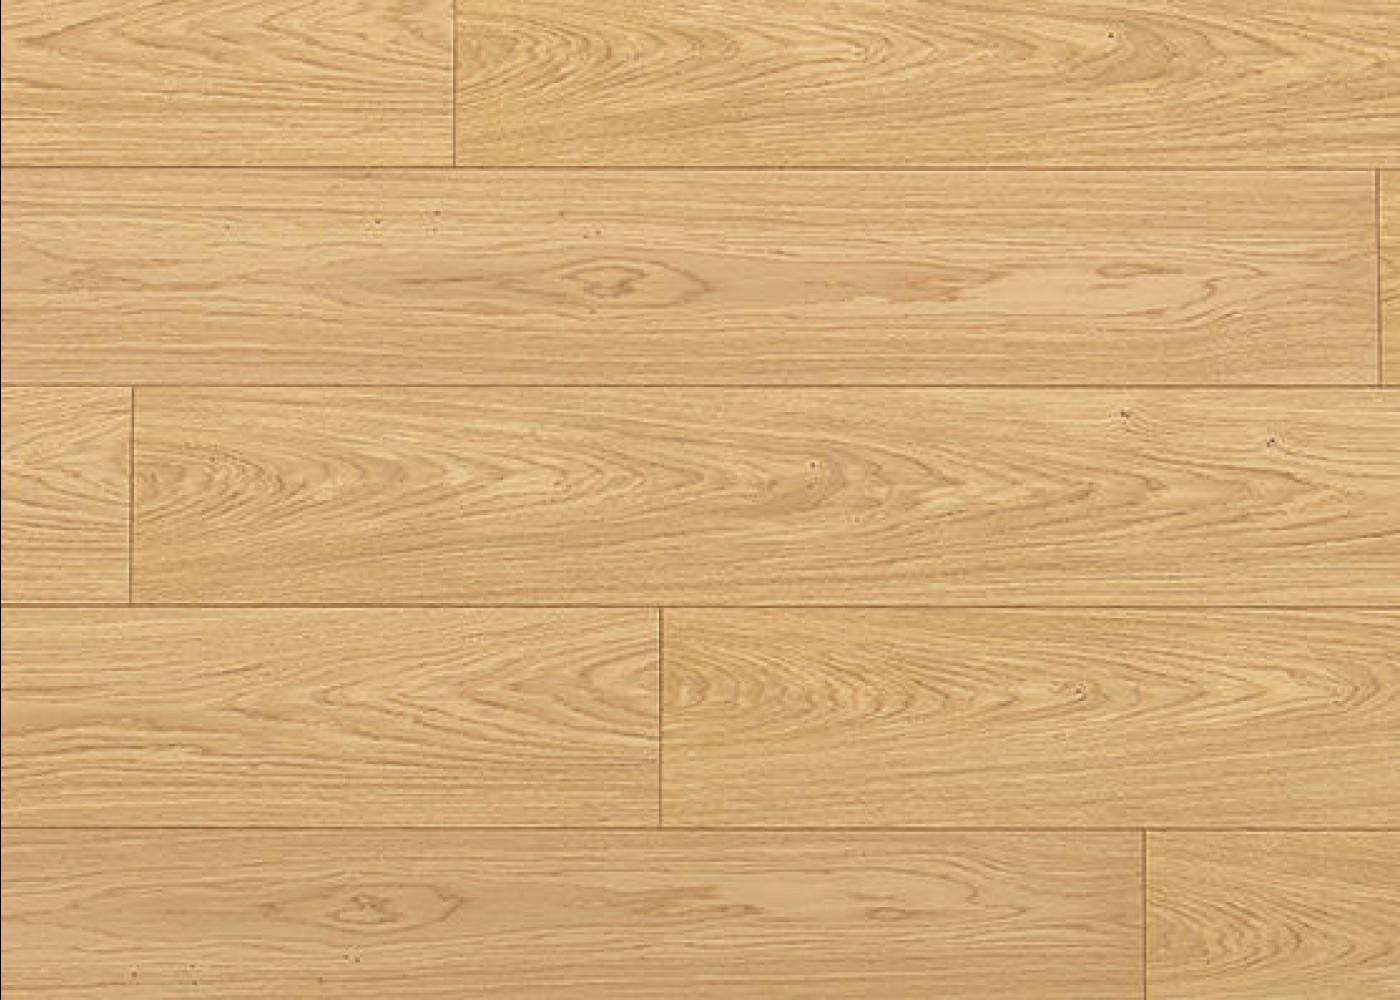 Sol plaqué bois Chêne SOLENZARA brossé vernis extra-mat - Summit - Select 10x233x2050